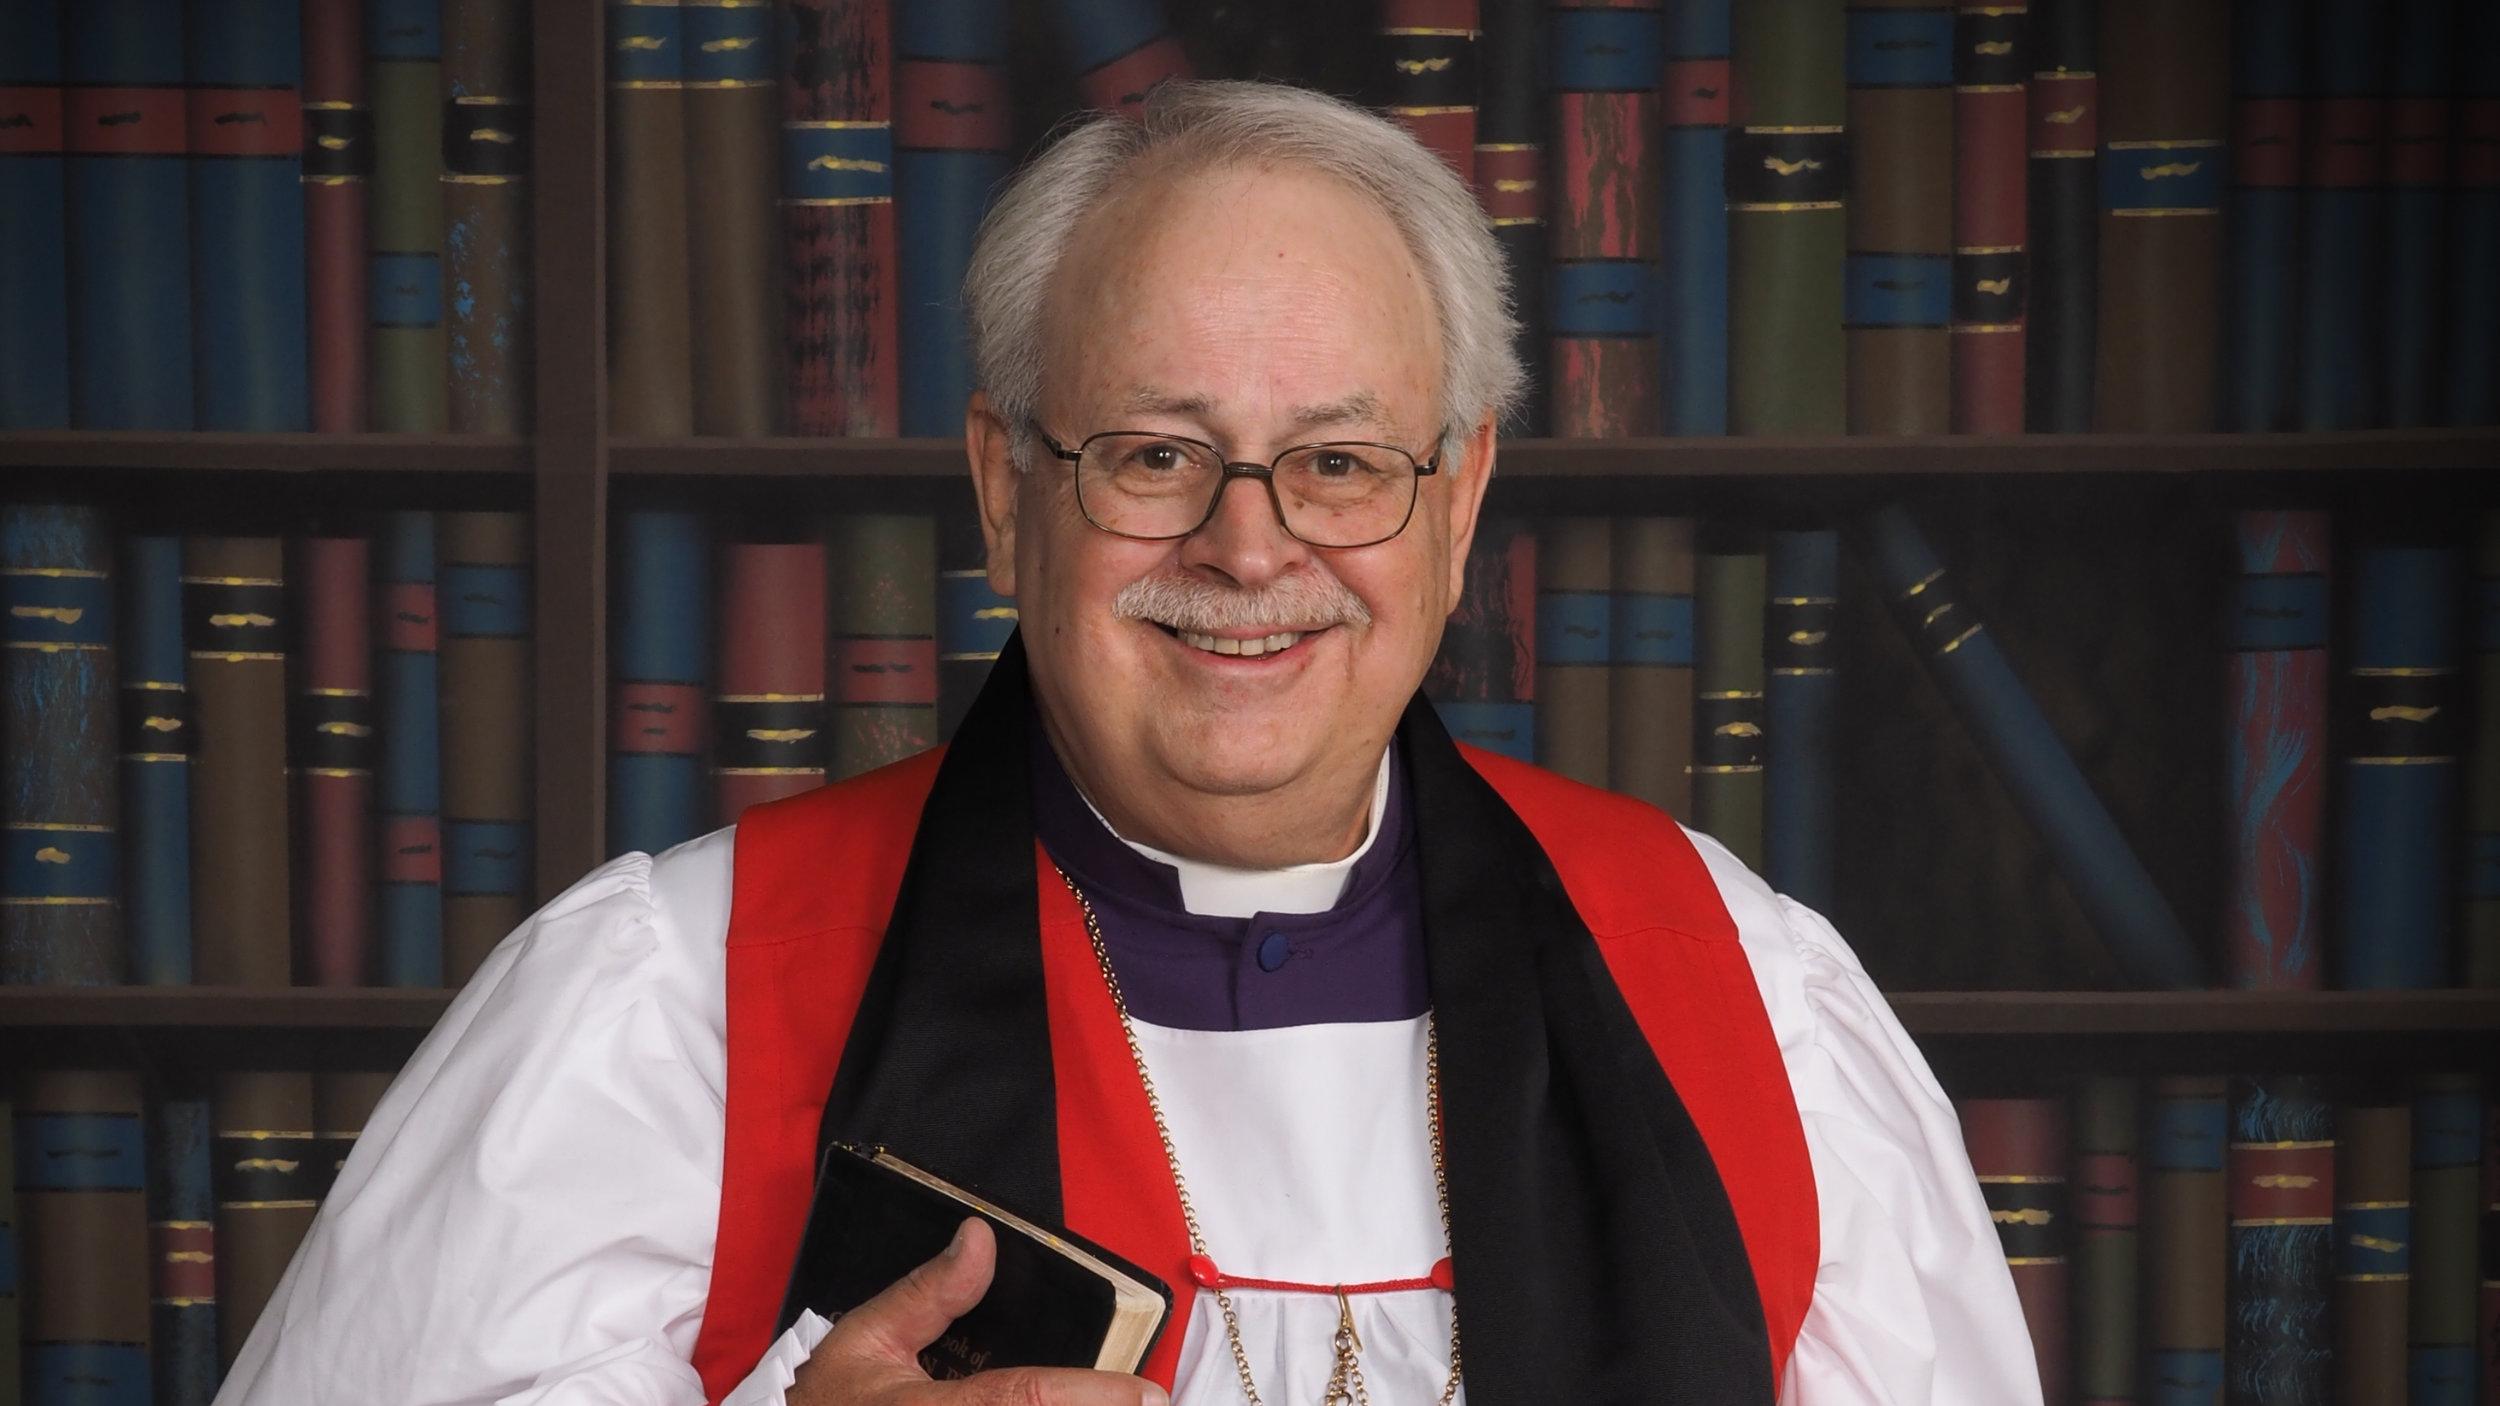 THE MOST REV. ROYAL U. GROTE, JR. Presiding Bishop 2014-2016